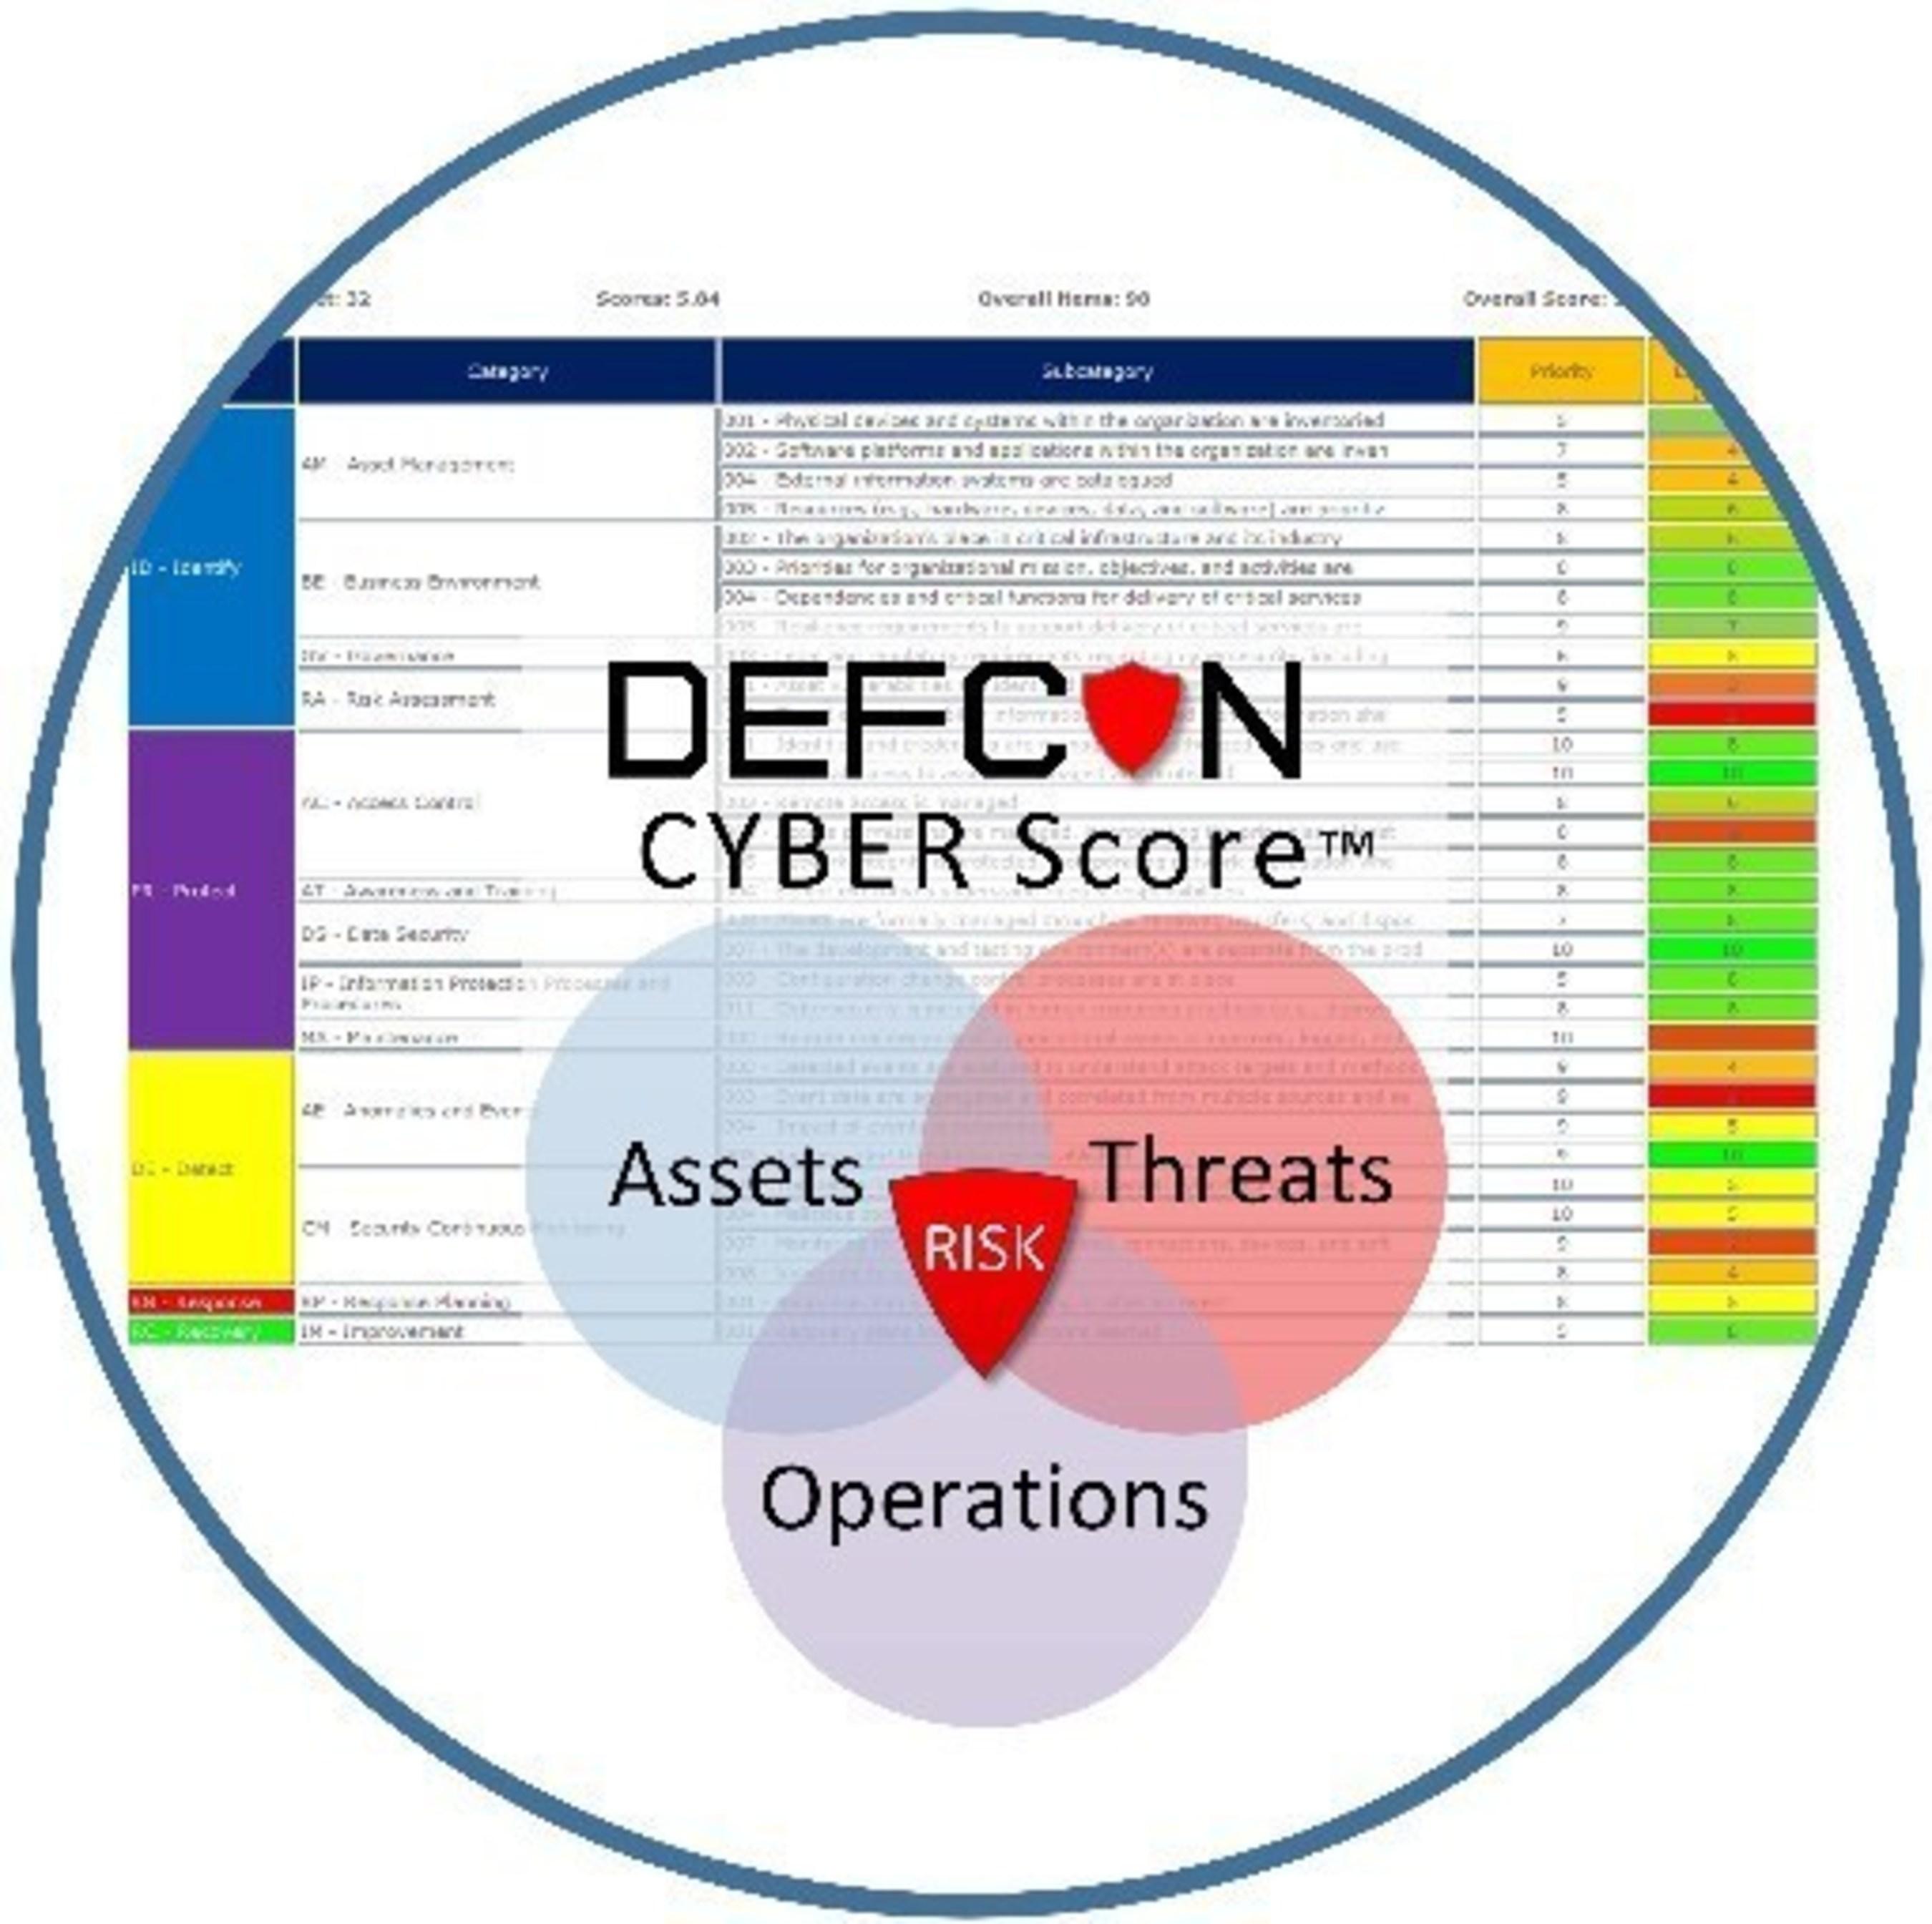 DEFCON CYBER™ Scores YOUR Risk Posture based on NIST